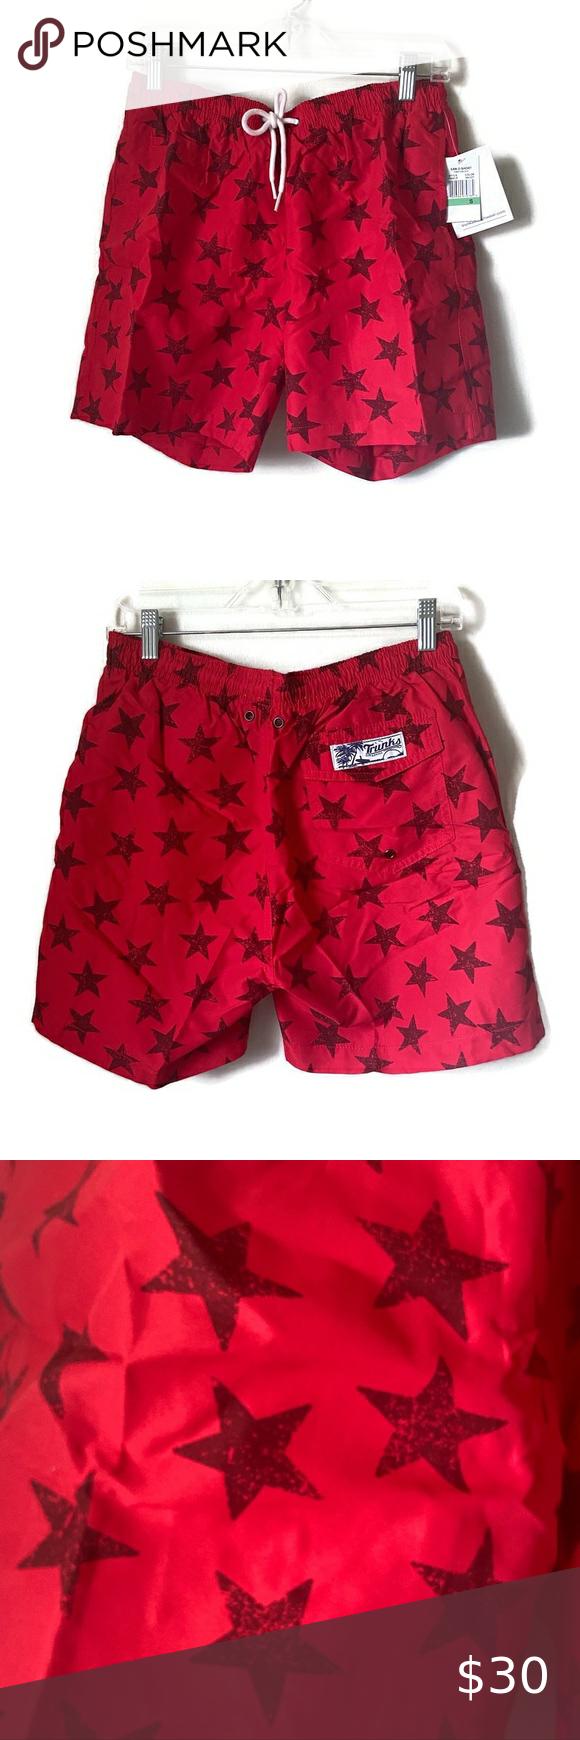 The Foundry Mens Red /& Navy Blue Tie Dye Swim Trunks Swim Shorts Board Shorts